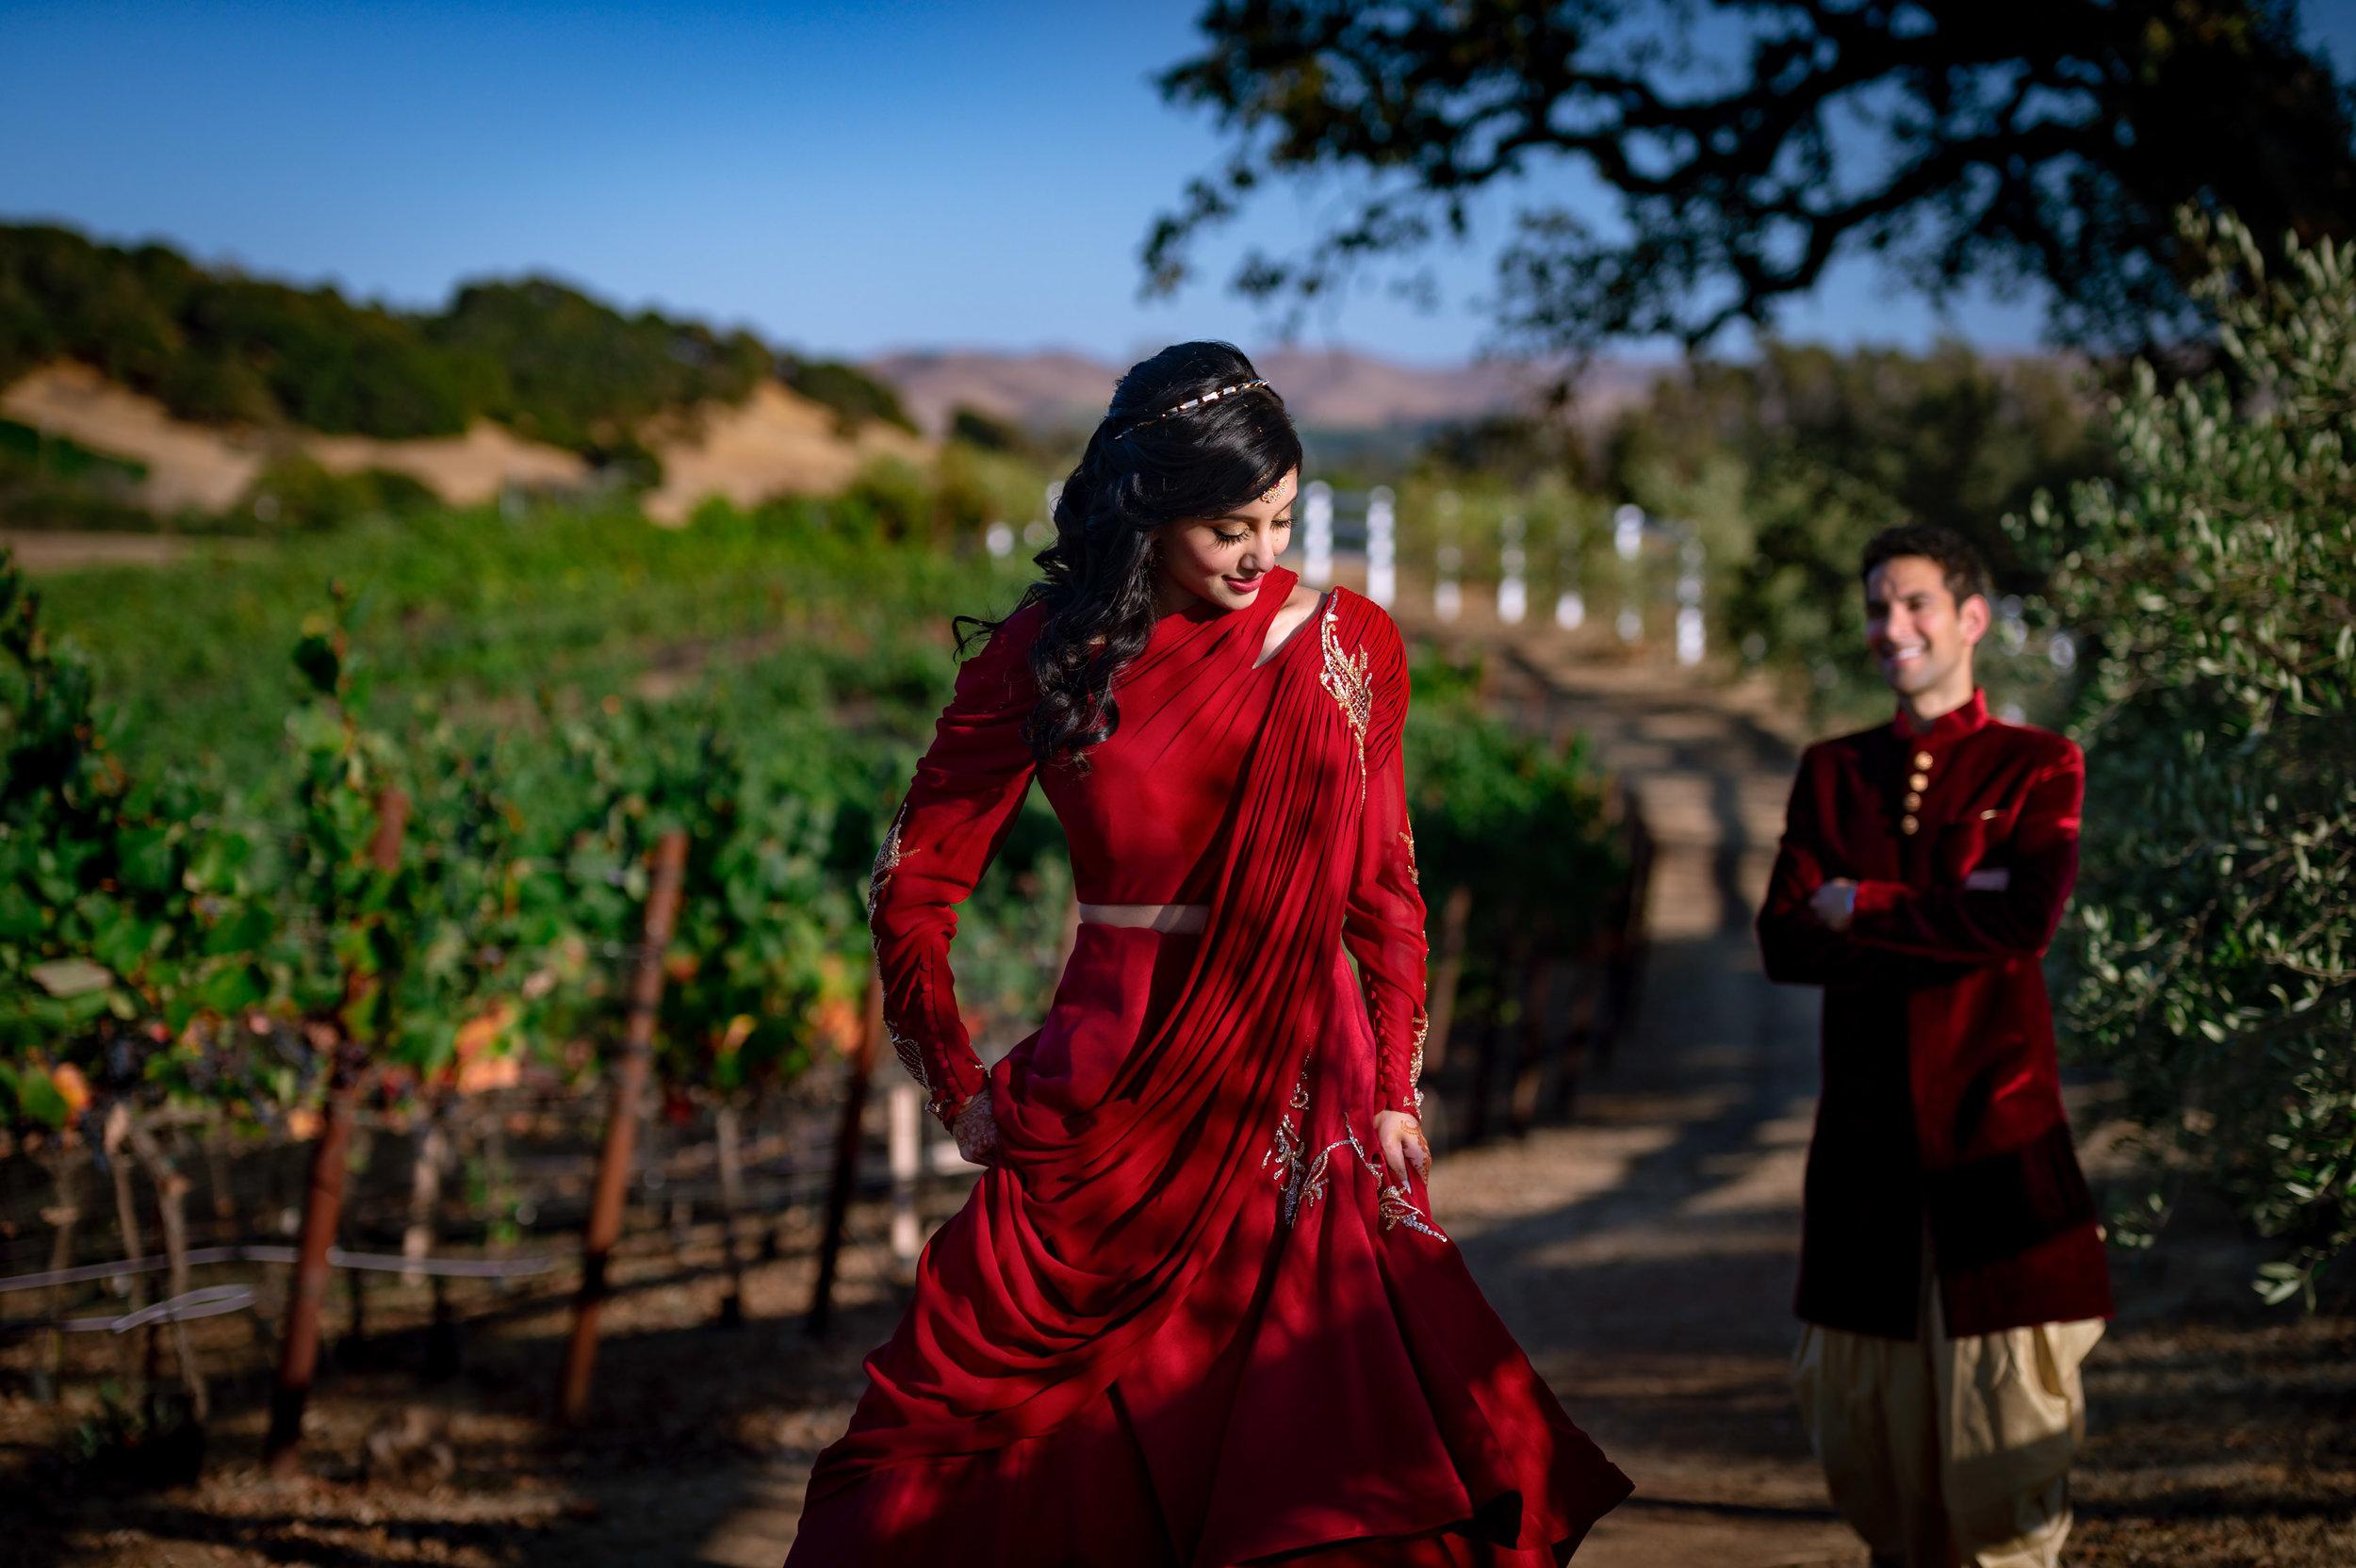 Meritage Indian wedding